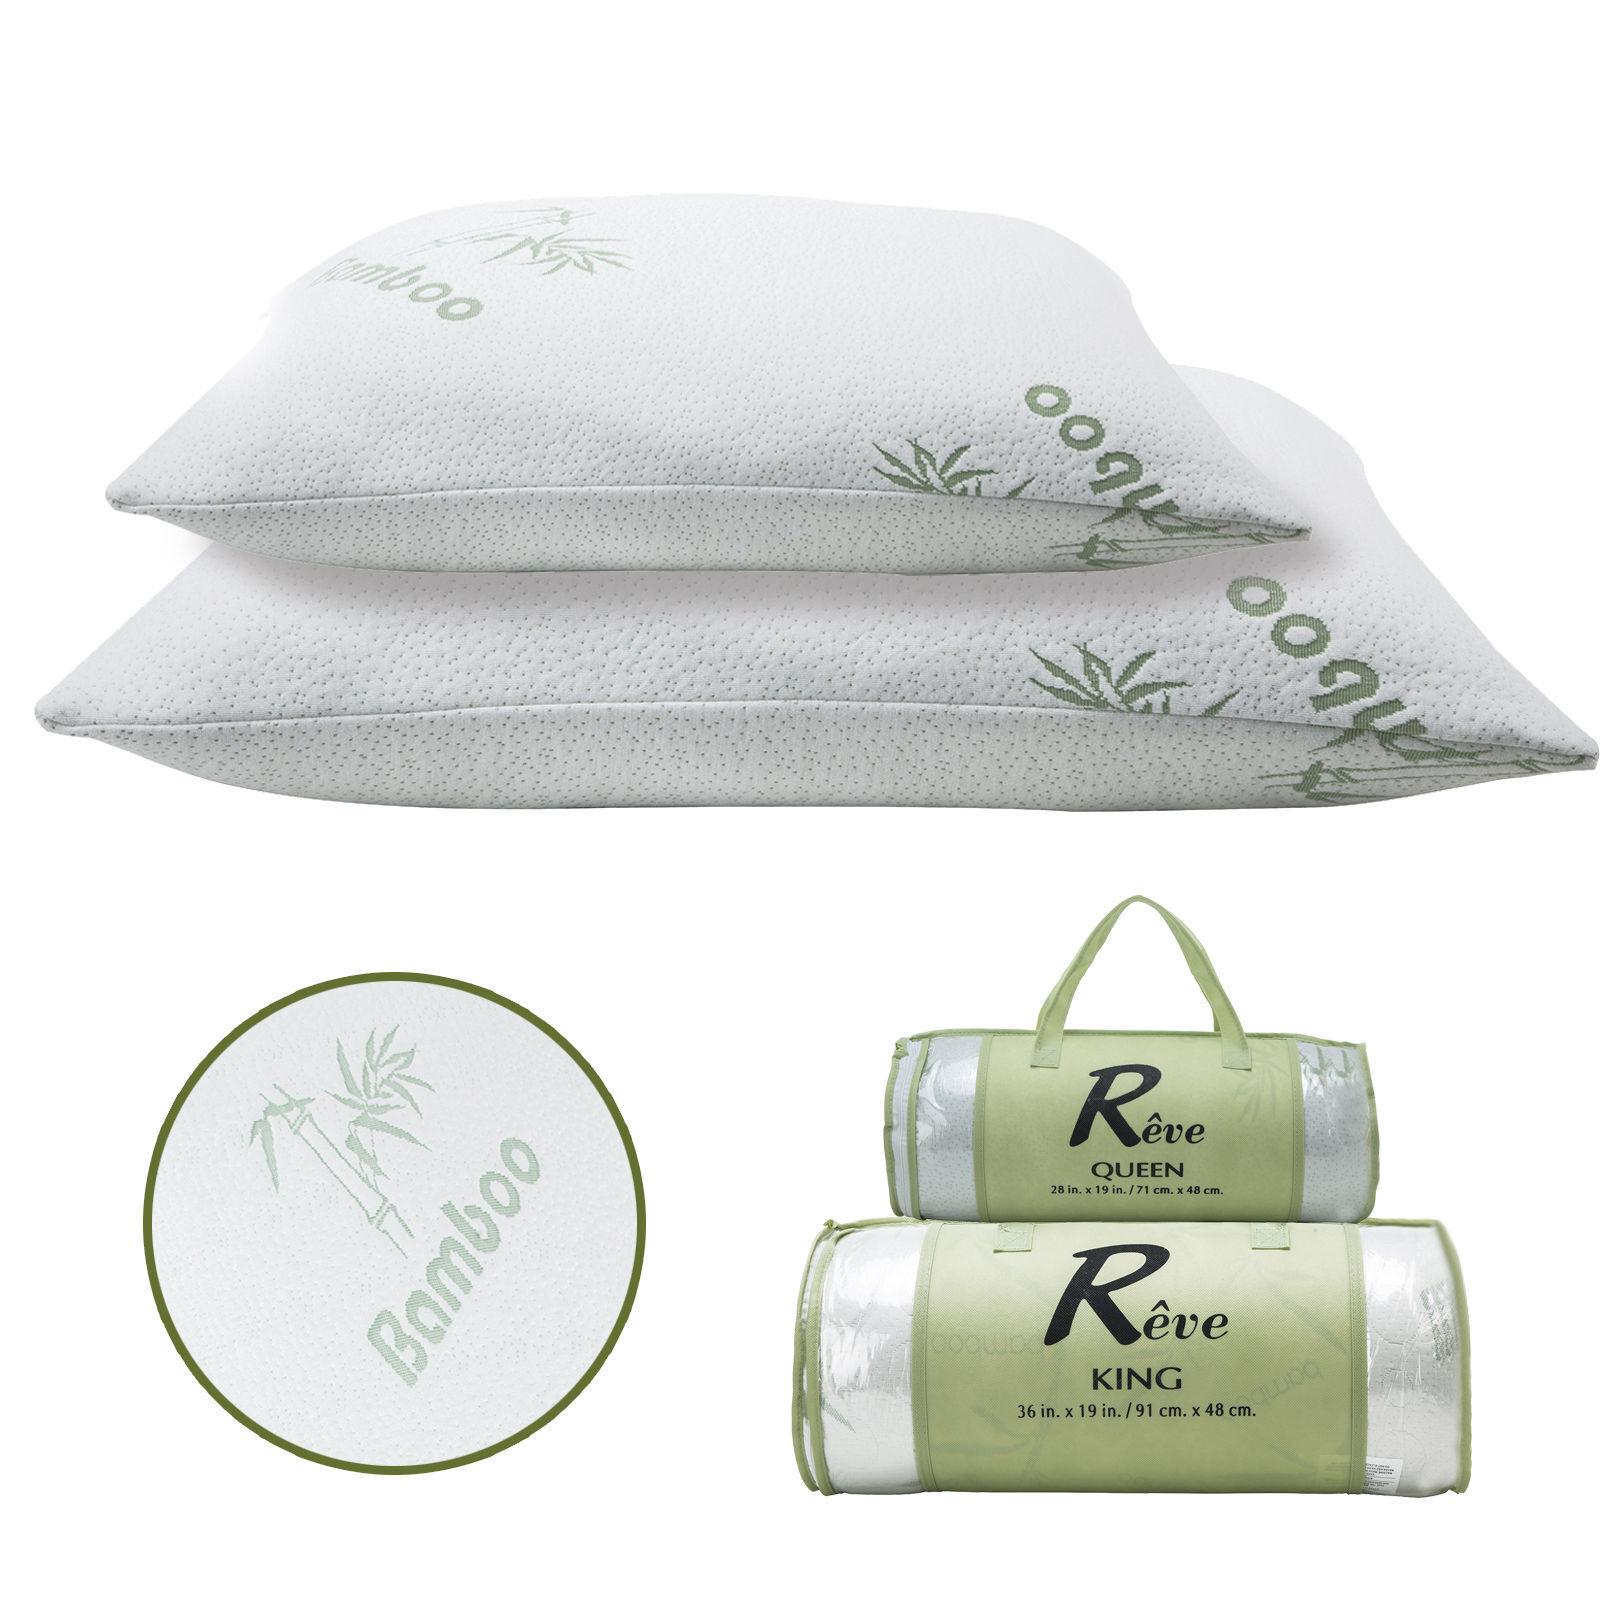 Queen King Size Pillow Hotel Comfort Hypoallergenic Bamboo